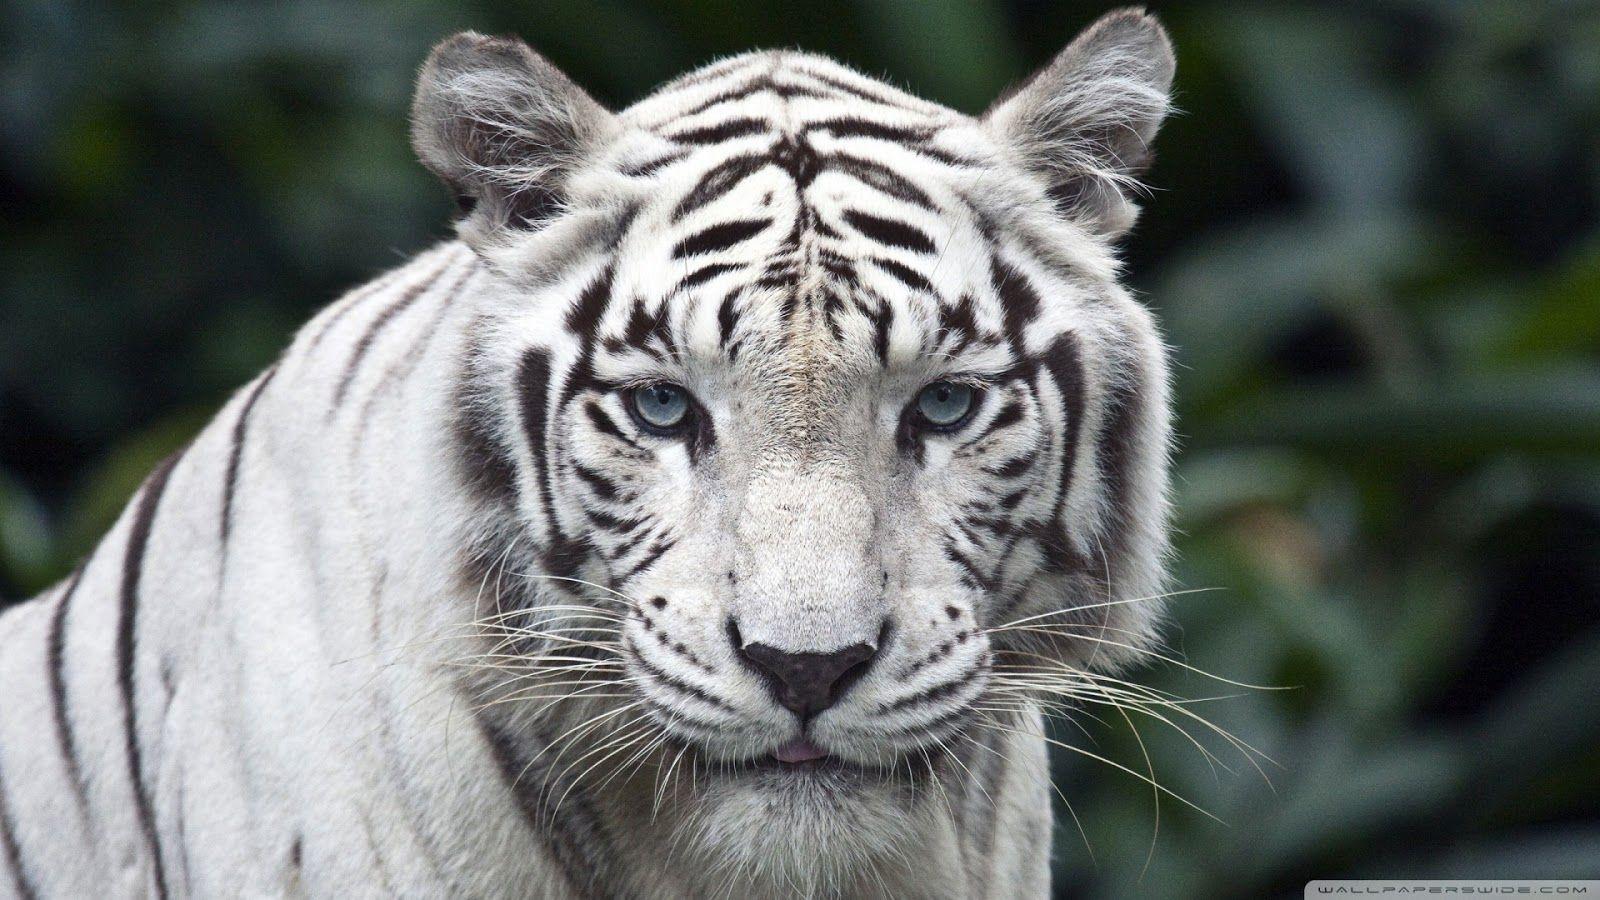 Hd Wallpapers White Tiger Hd Wallpaper 1080p Pet Tiger White Tiger Tiger Poster